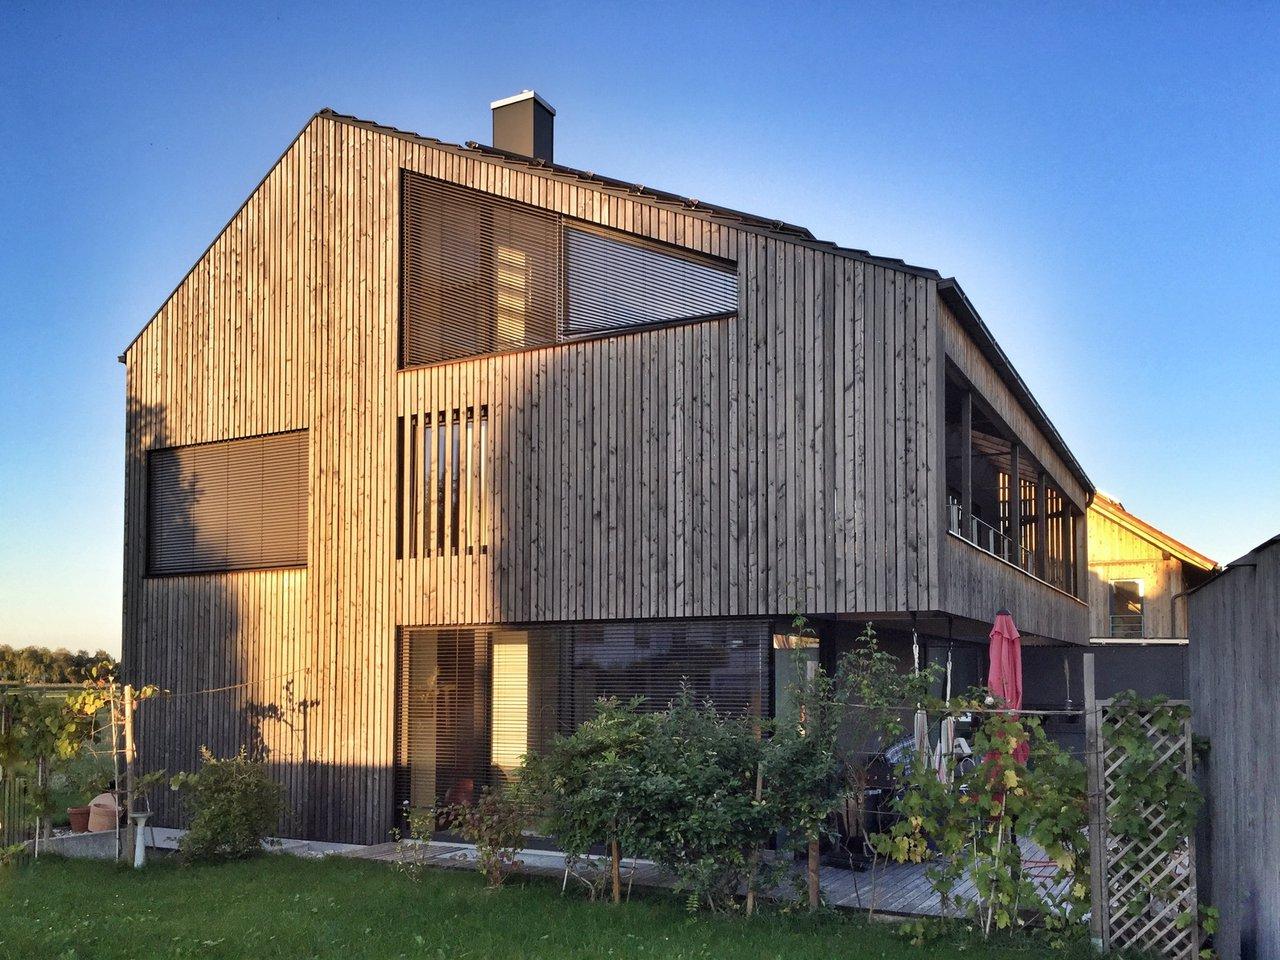 Holz Fassaden holzfassaden schöne optik gute wärmedämmung traczewski malerei gmbh